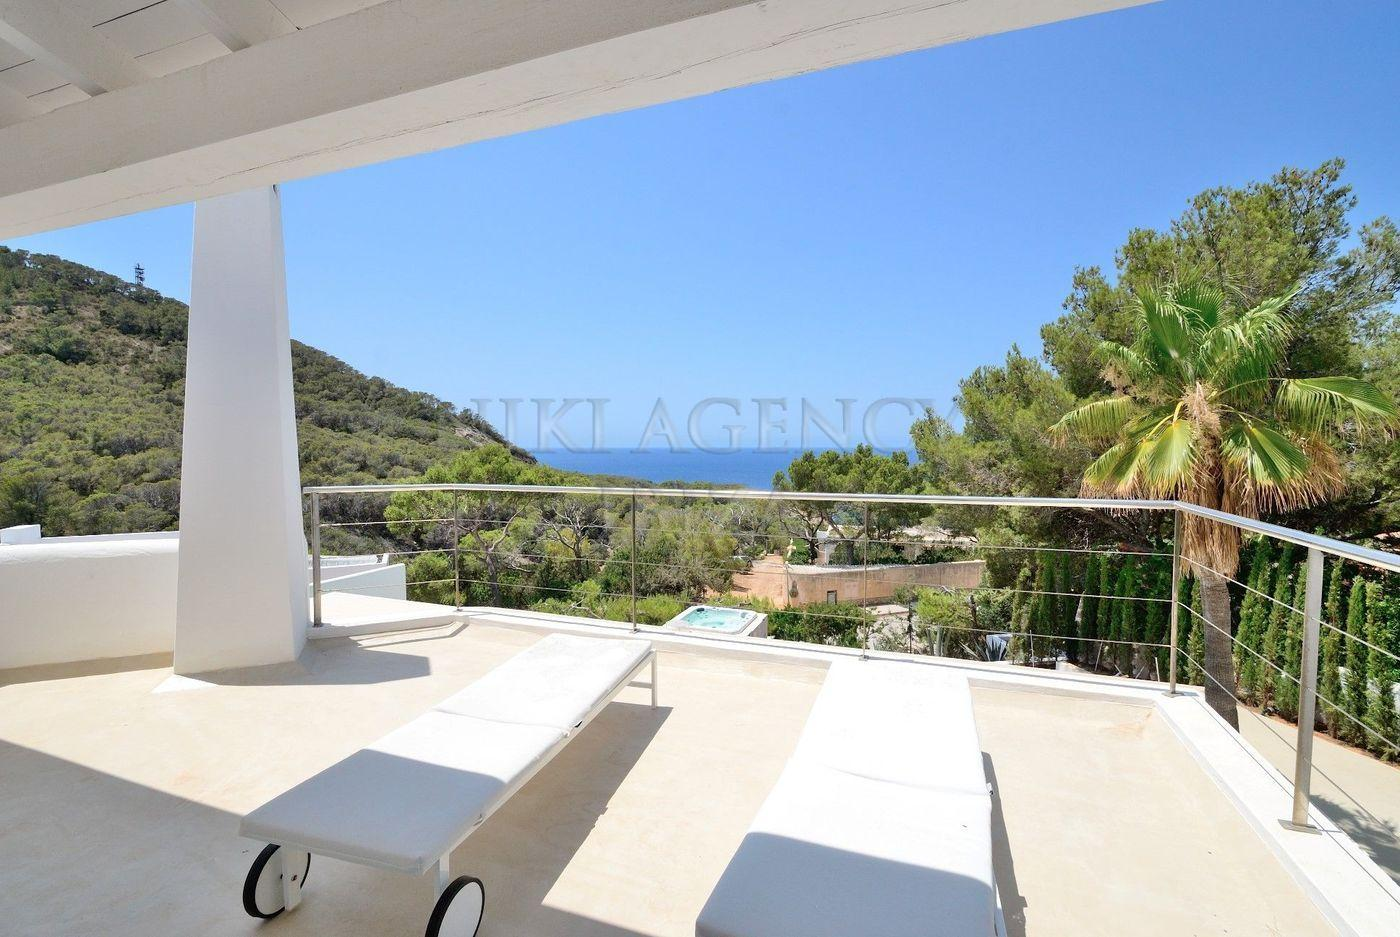 16. House for sale in Sant Josep de sa Talaia Ibiza - Fantastic 4 Bed Villa For Sale in Sant Josep de sa Talaia, Ibiza!